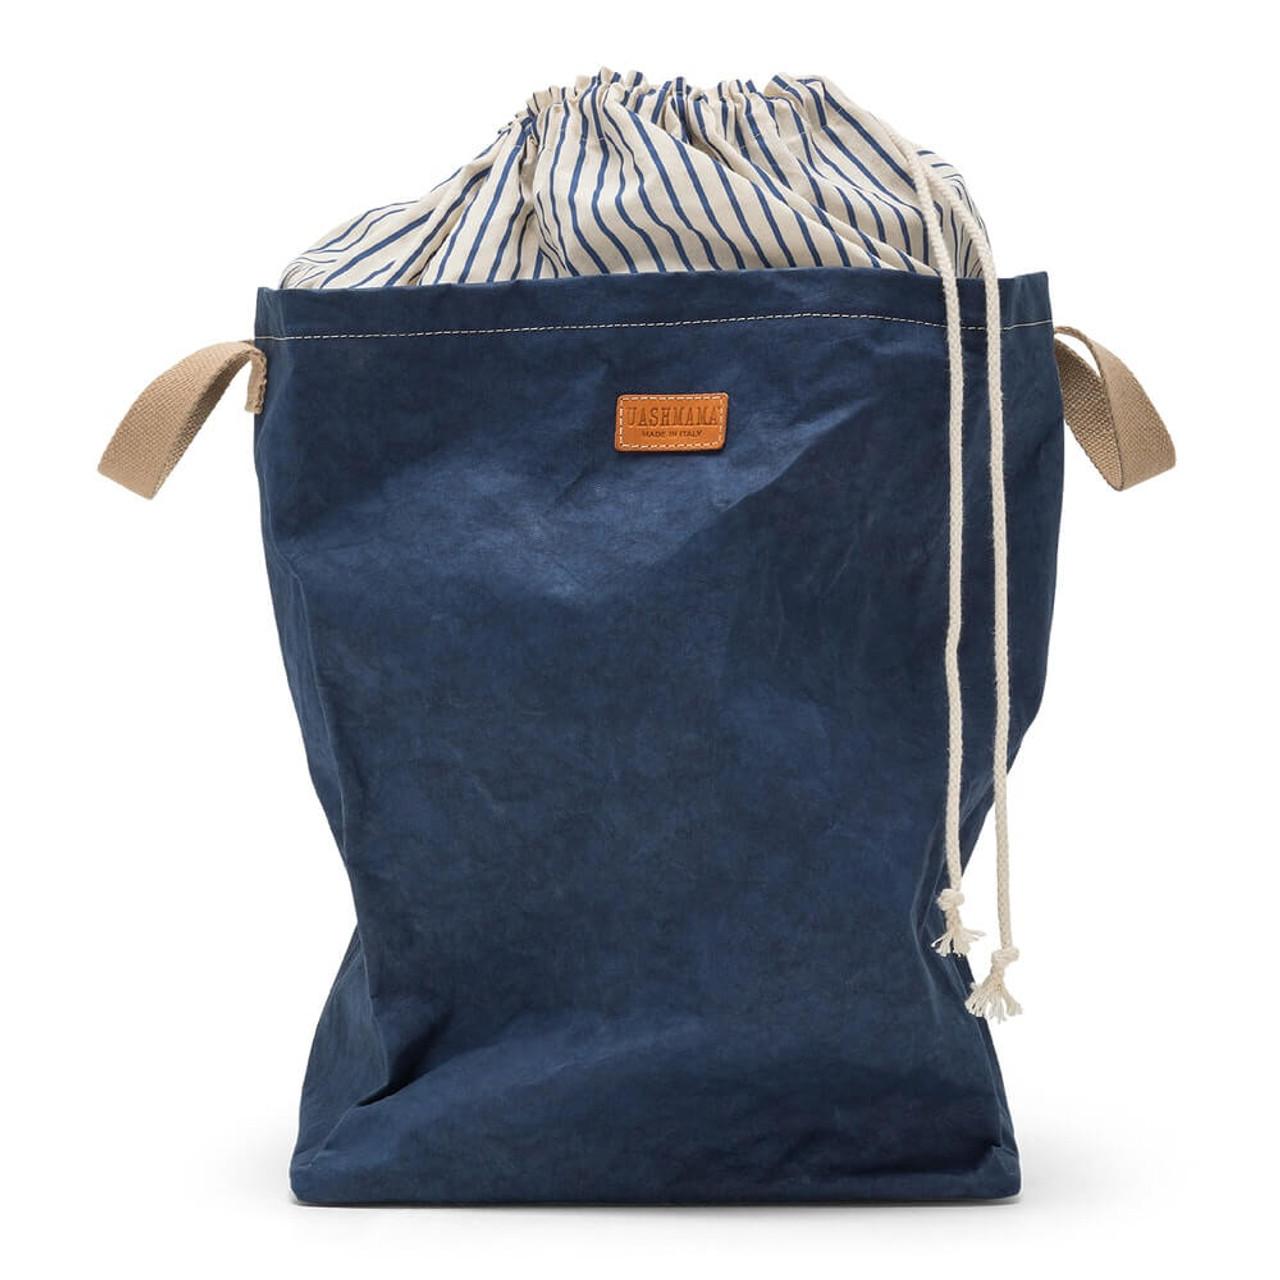 uashmama positano laundry organic paper blue